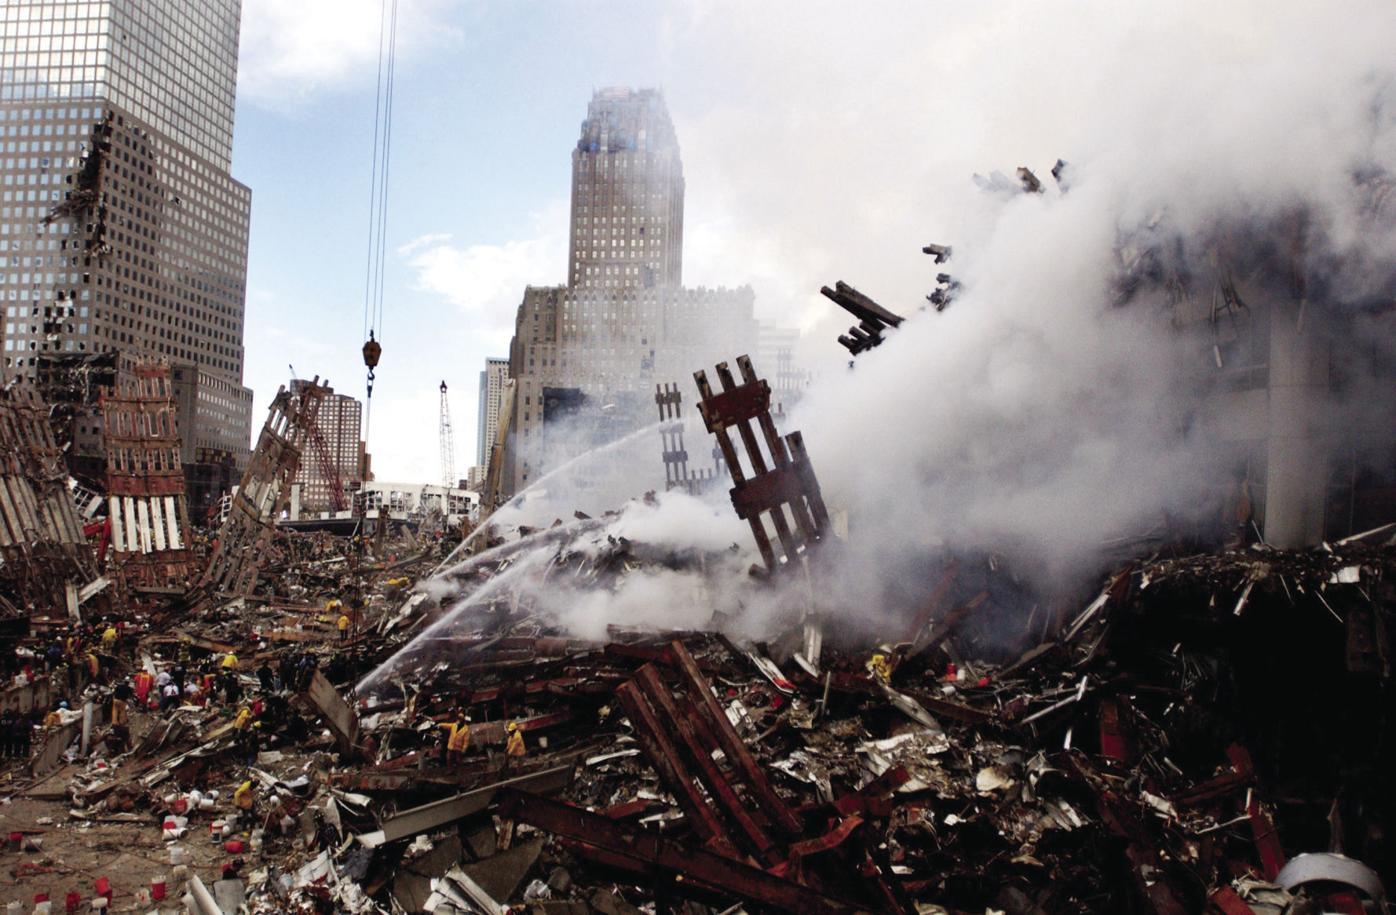 REMEMBERING A TRAGIC DAY IN AMERICA